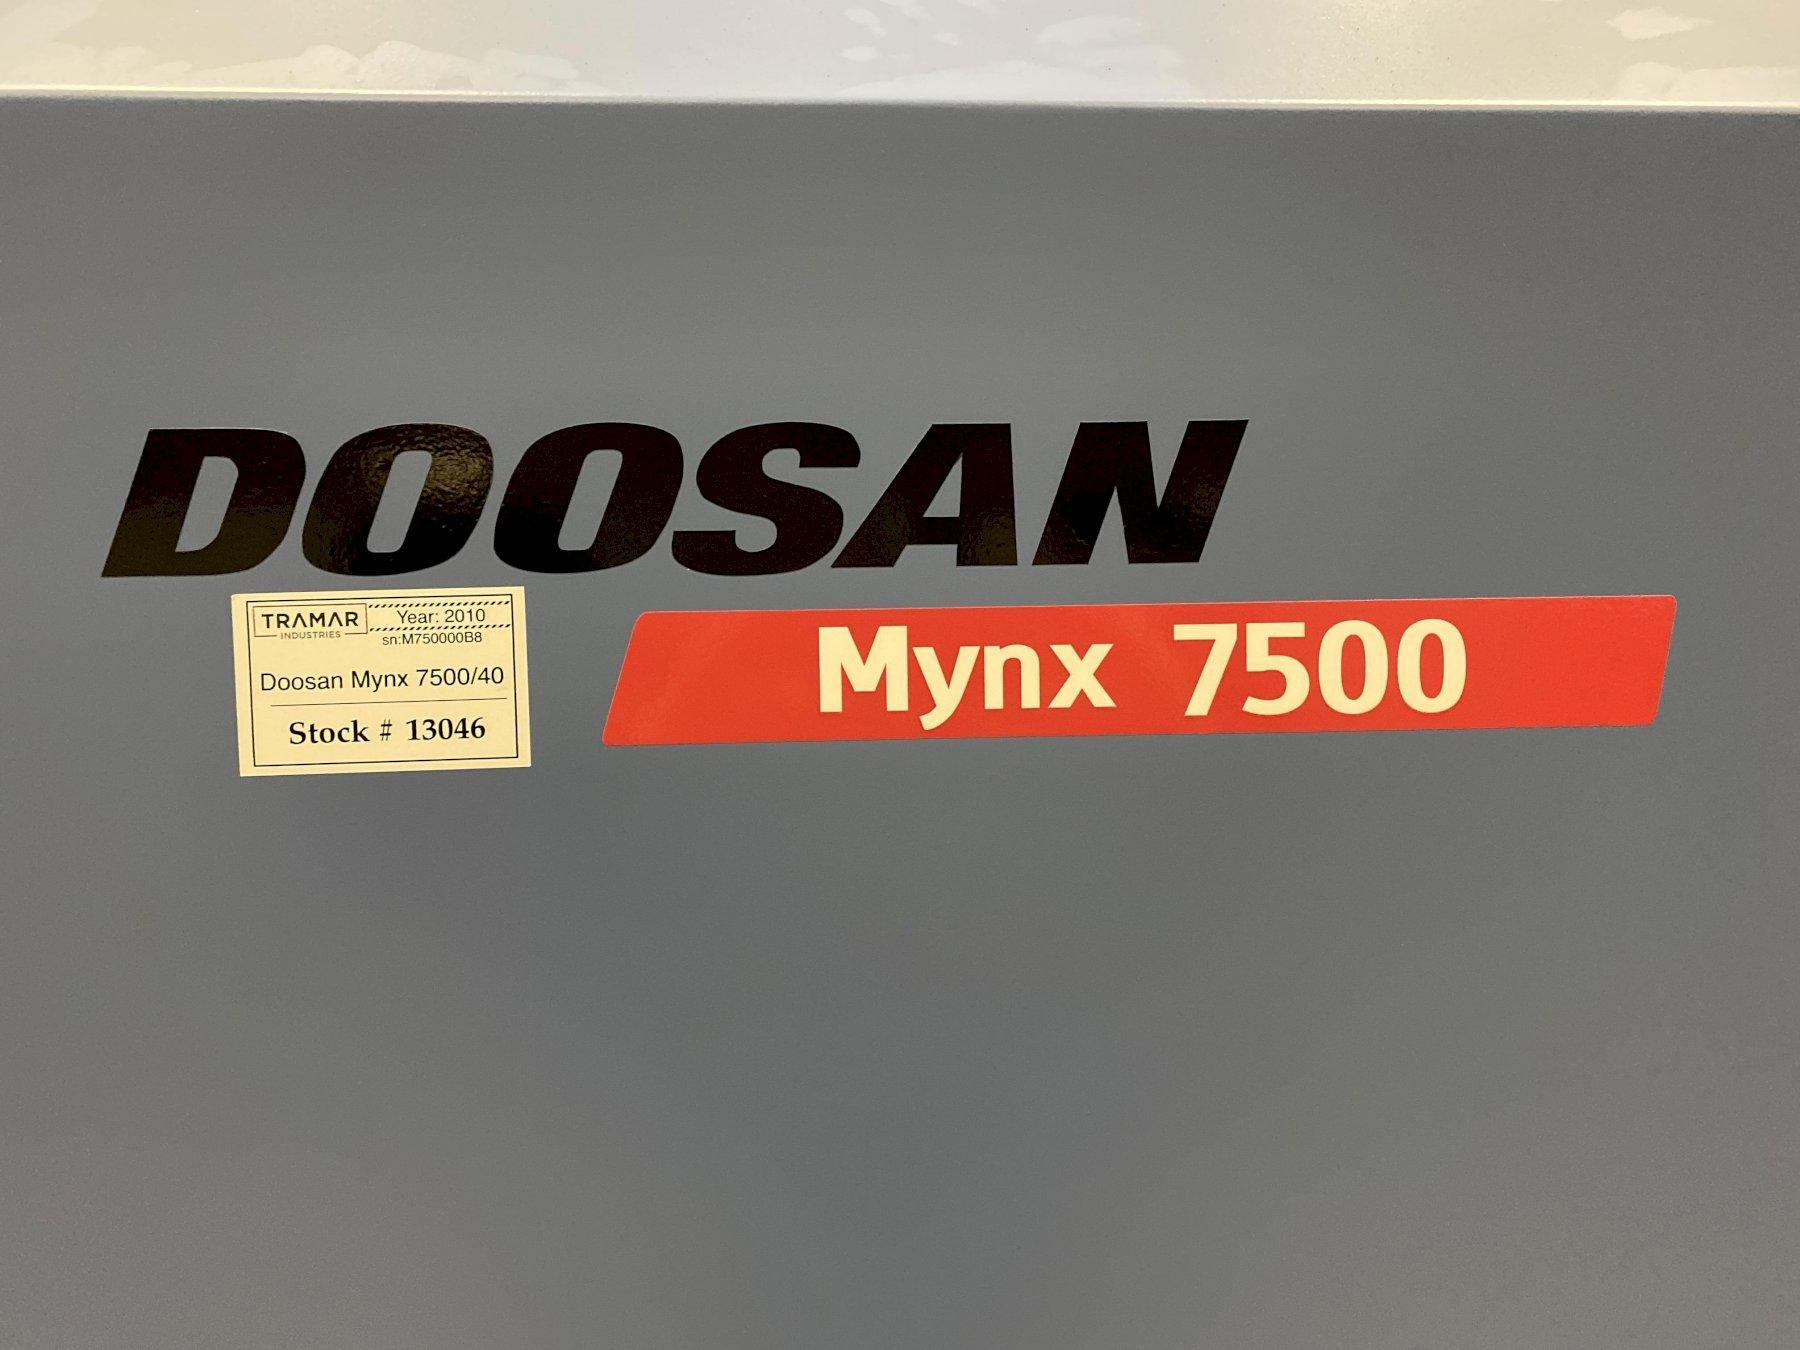 2010 DOOSAN Mynx 7500 - Vertical Machining Center